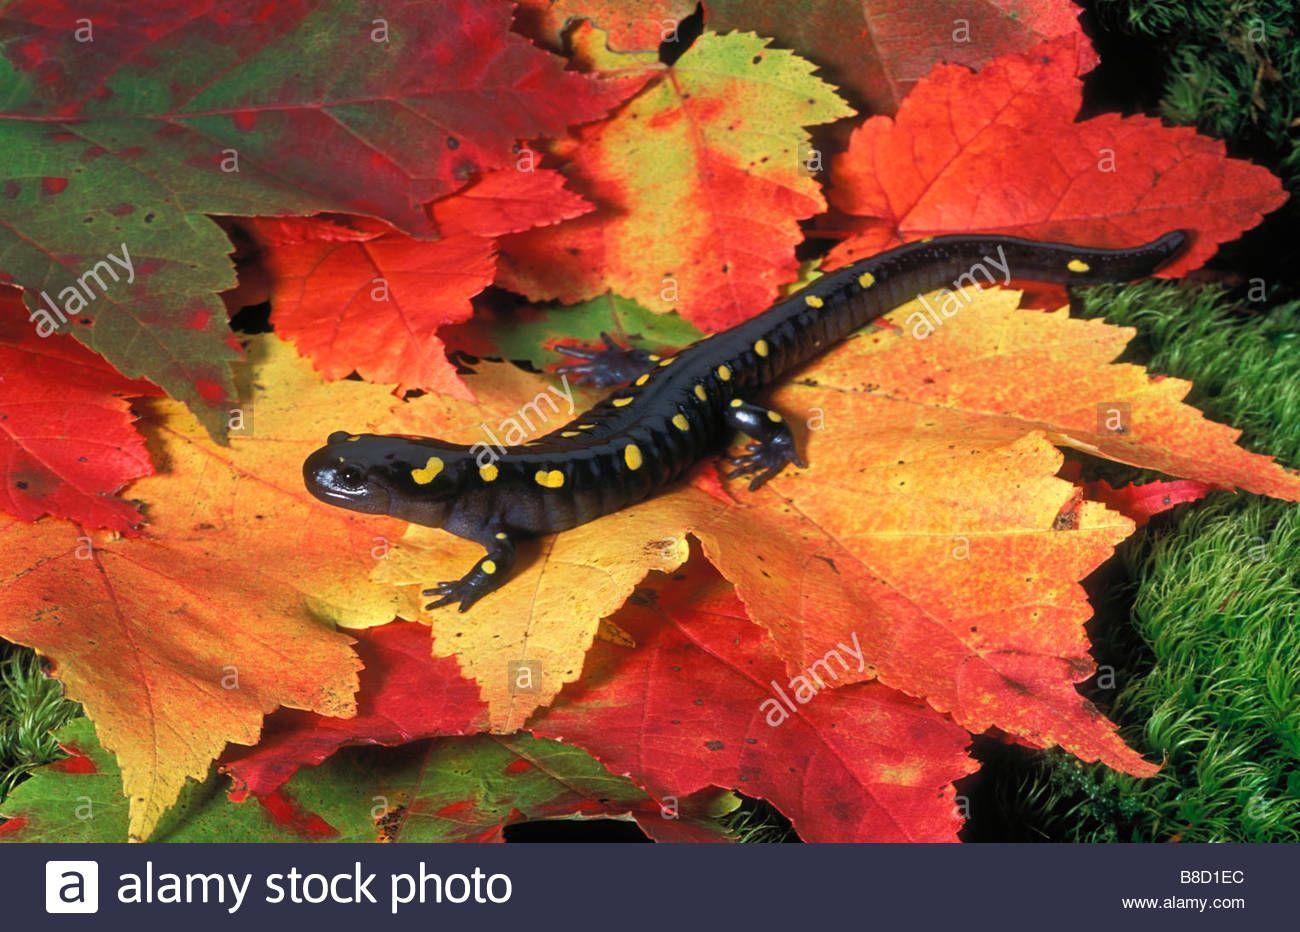 Scorpion Scorpion, Animals, Ticks